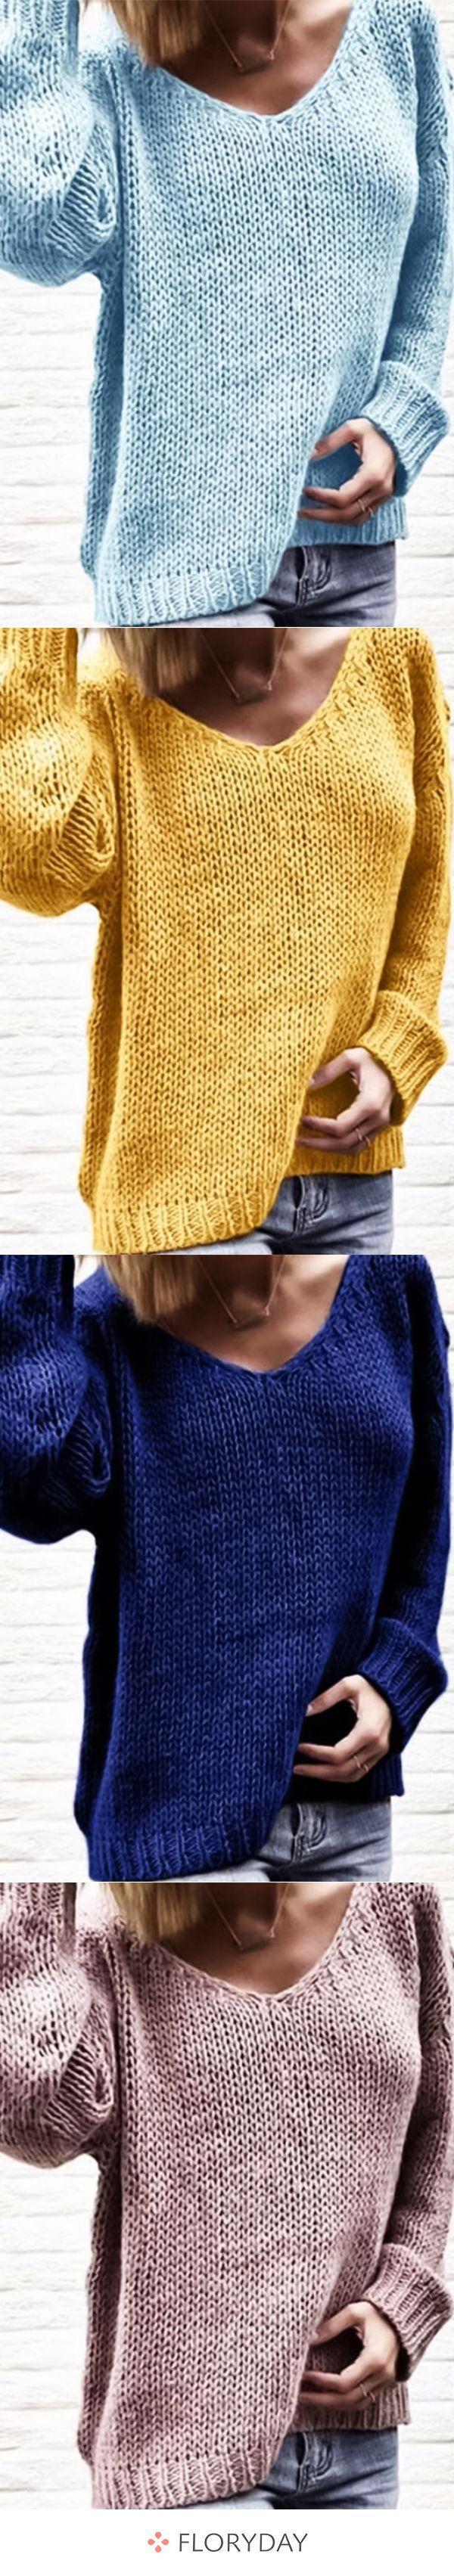 Photo of Lockerer Longshift-Pullover mit V-Ausschnitt,  #Lockerer #LongshiftPullover #mit #StrickenAnl…